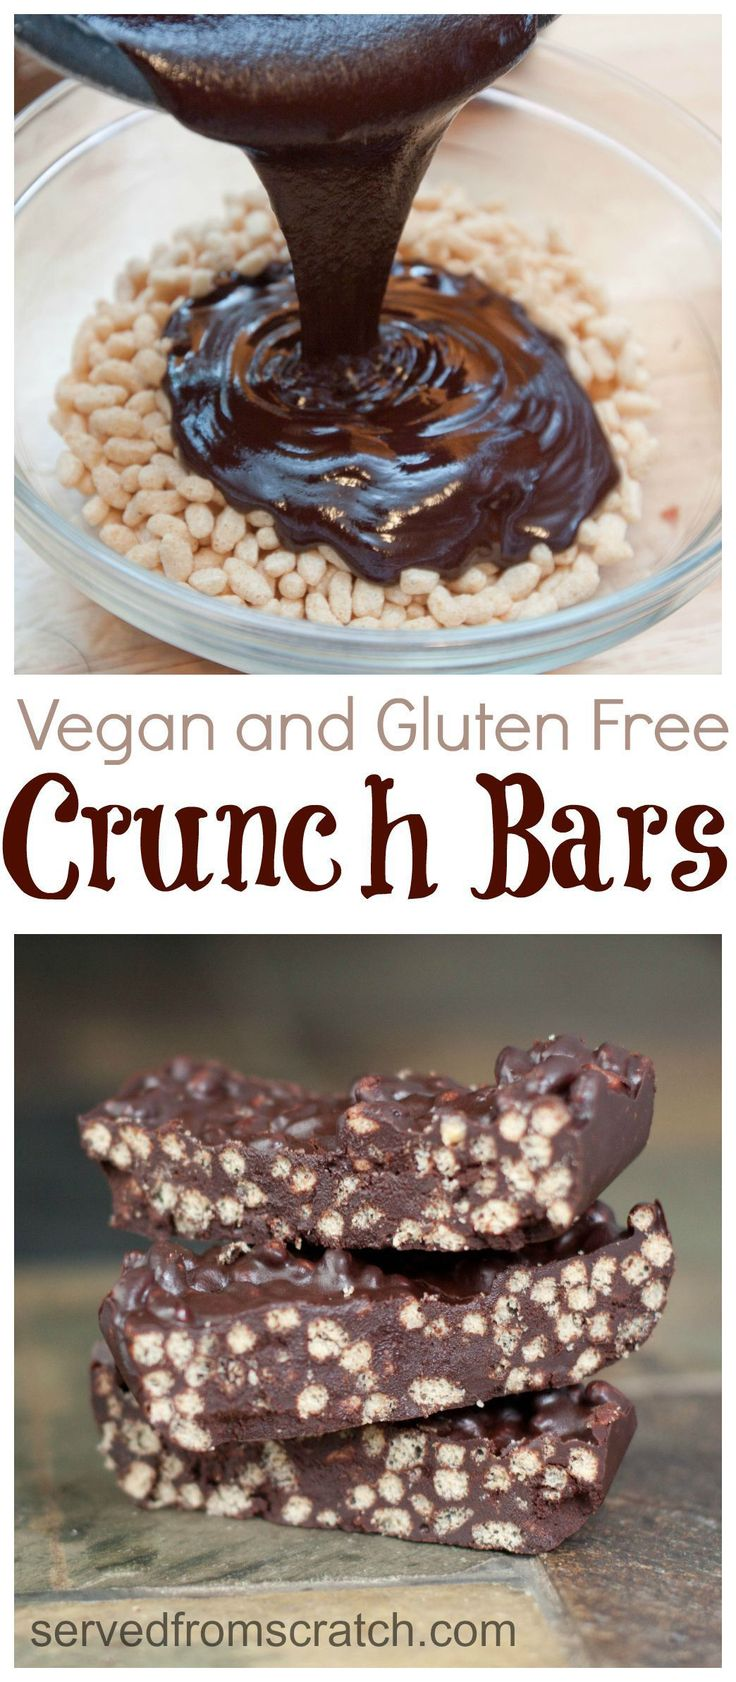 No added sugar, Vegan, and Gluten Free chocolate Crunch Bars!